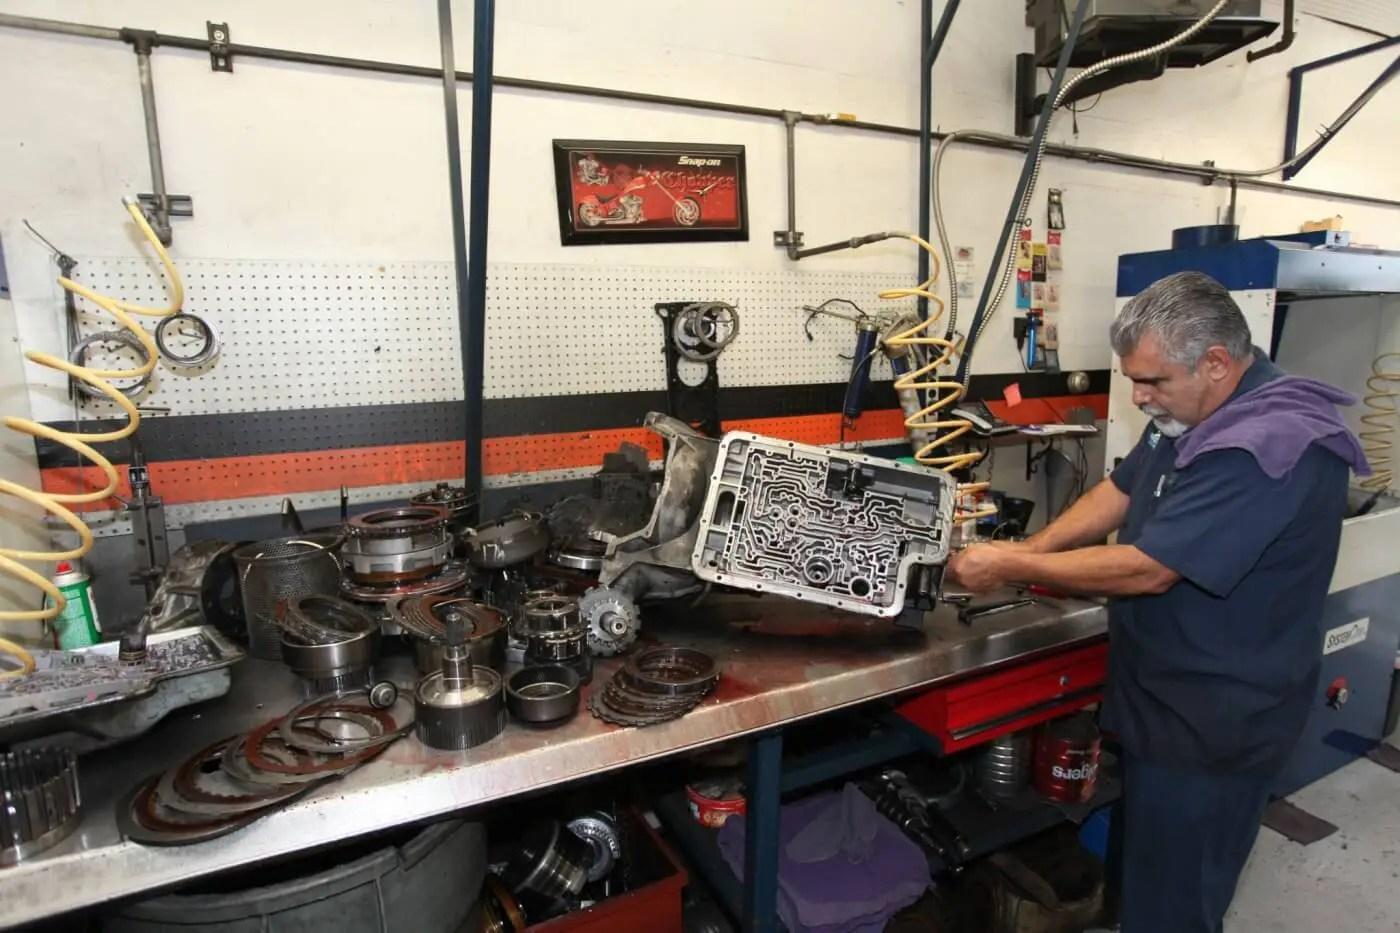 One Tough Tranny: A Mid-Level Ford Transmission Rebuild